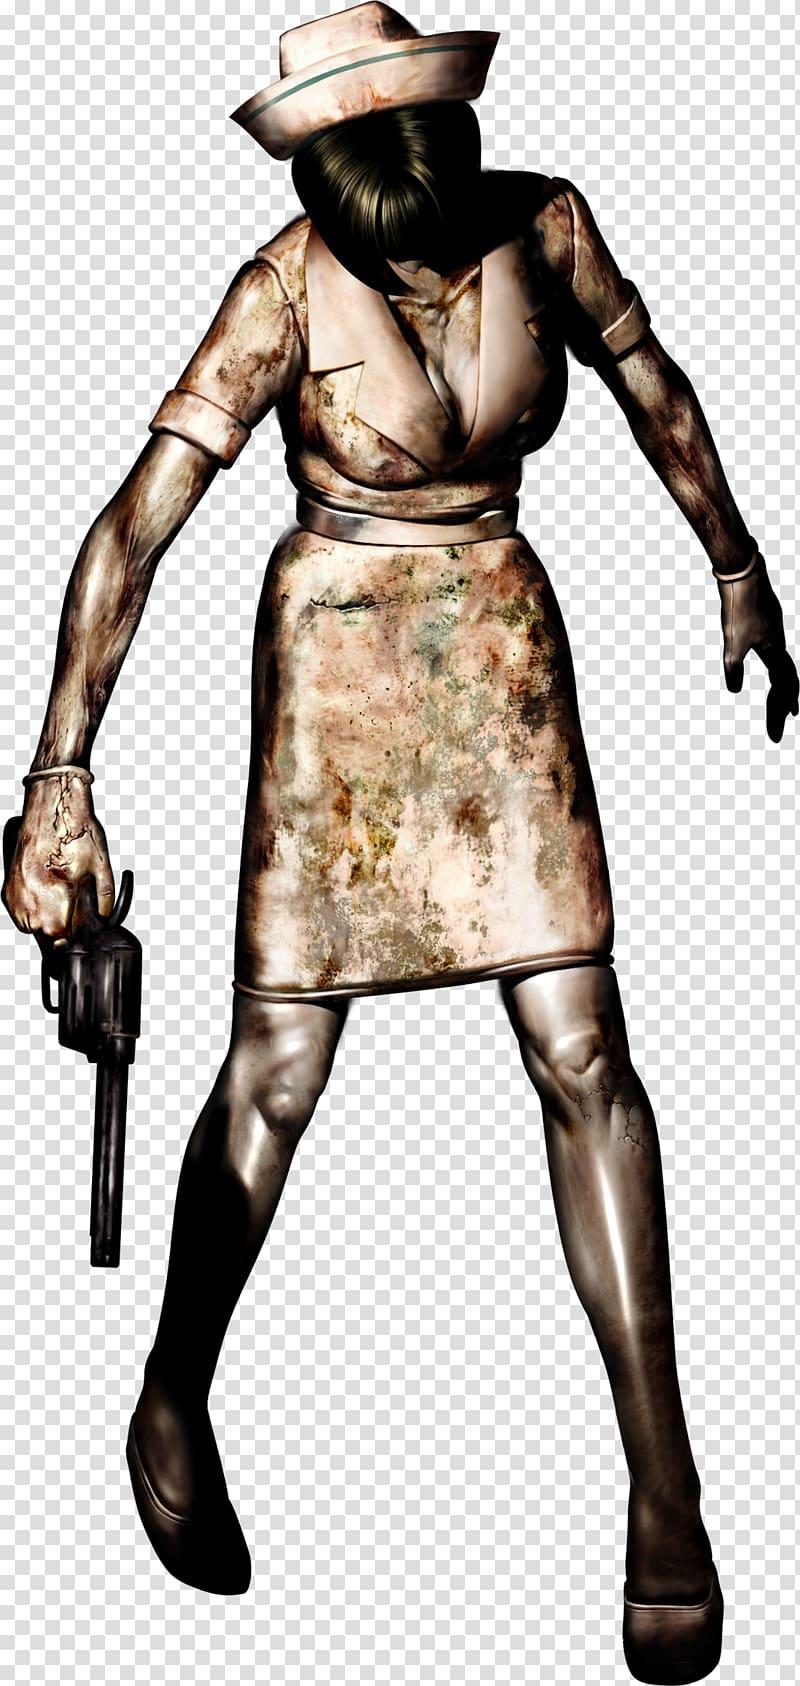 Silent Hill 3 Silent Hill: Homecoming Heather Mason Silent.